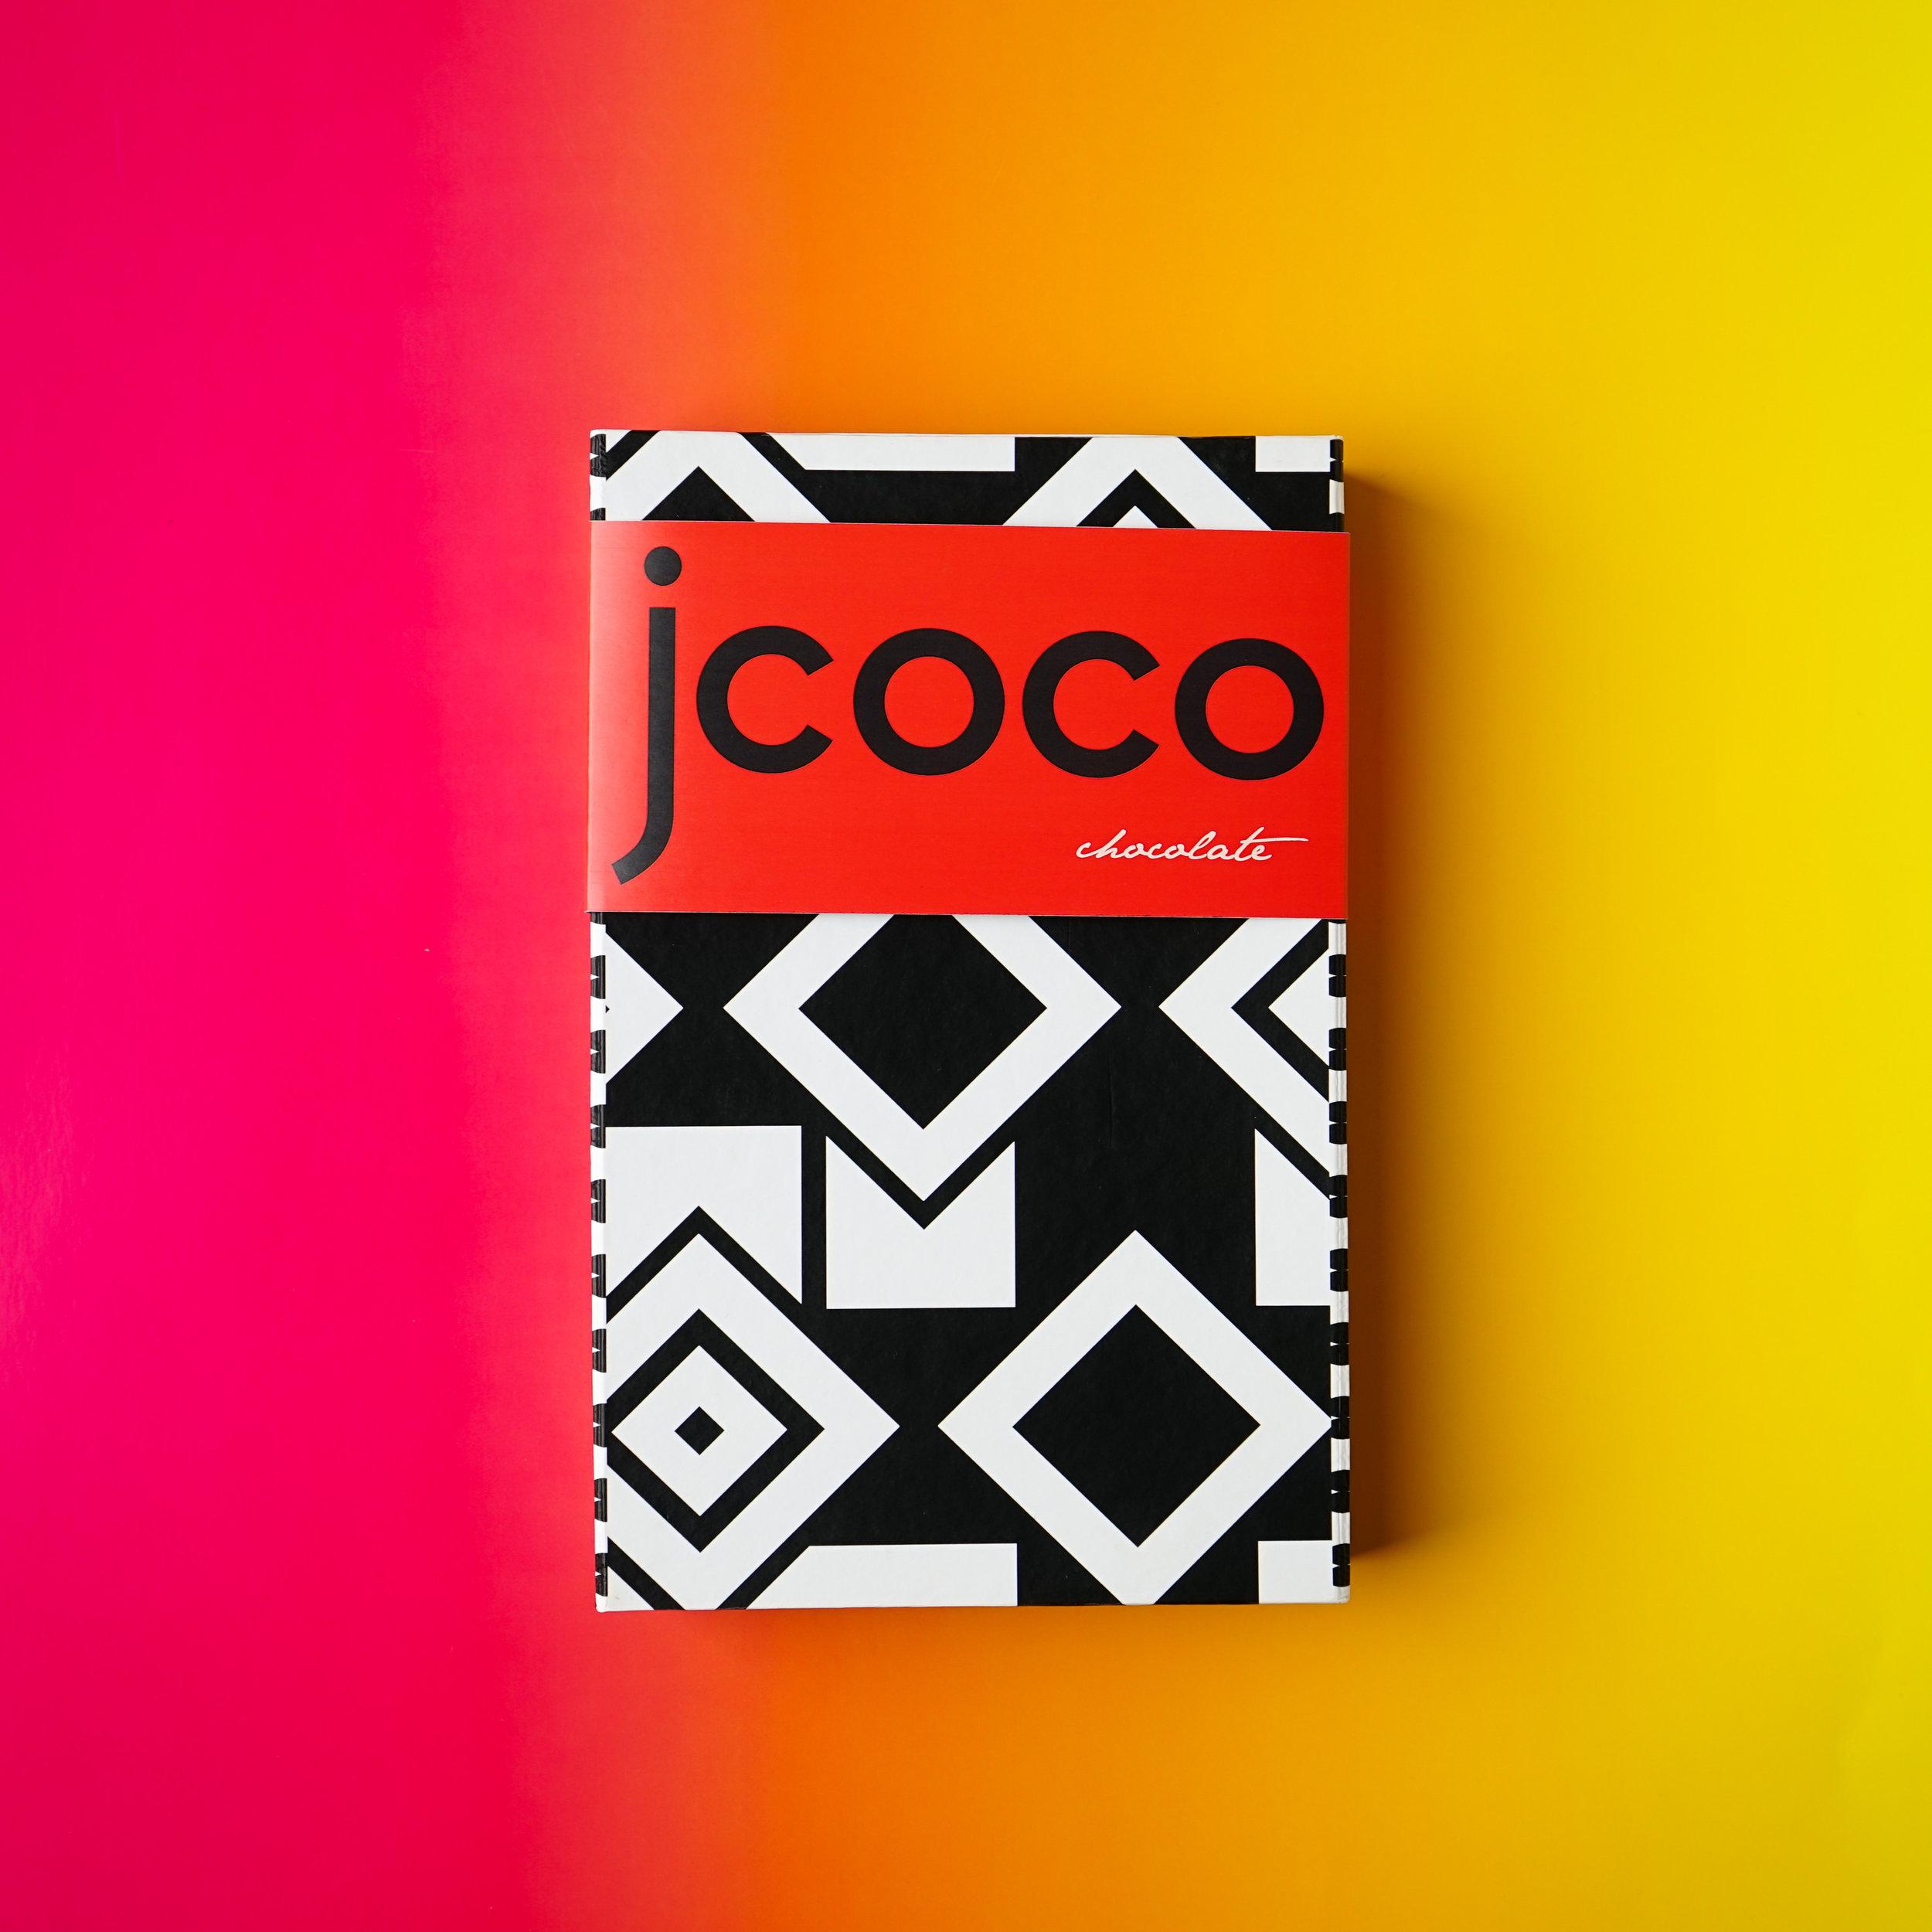 jcoco-01488.jpg